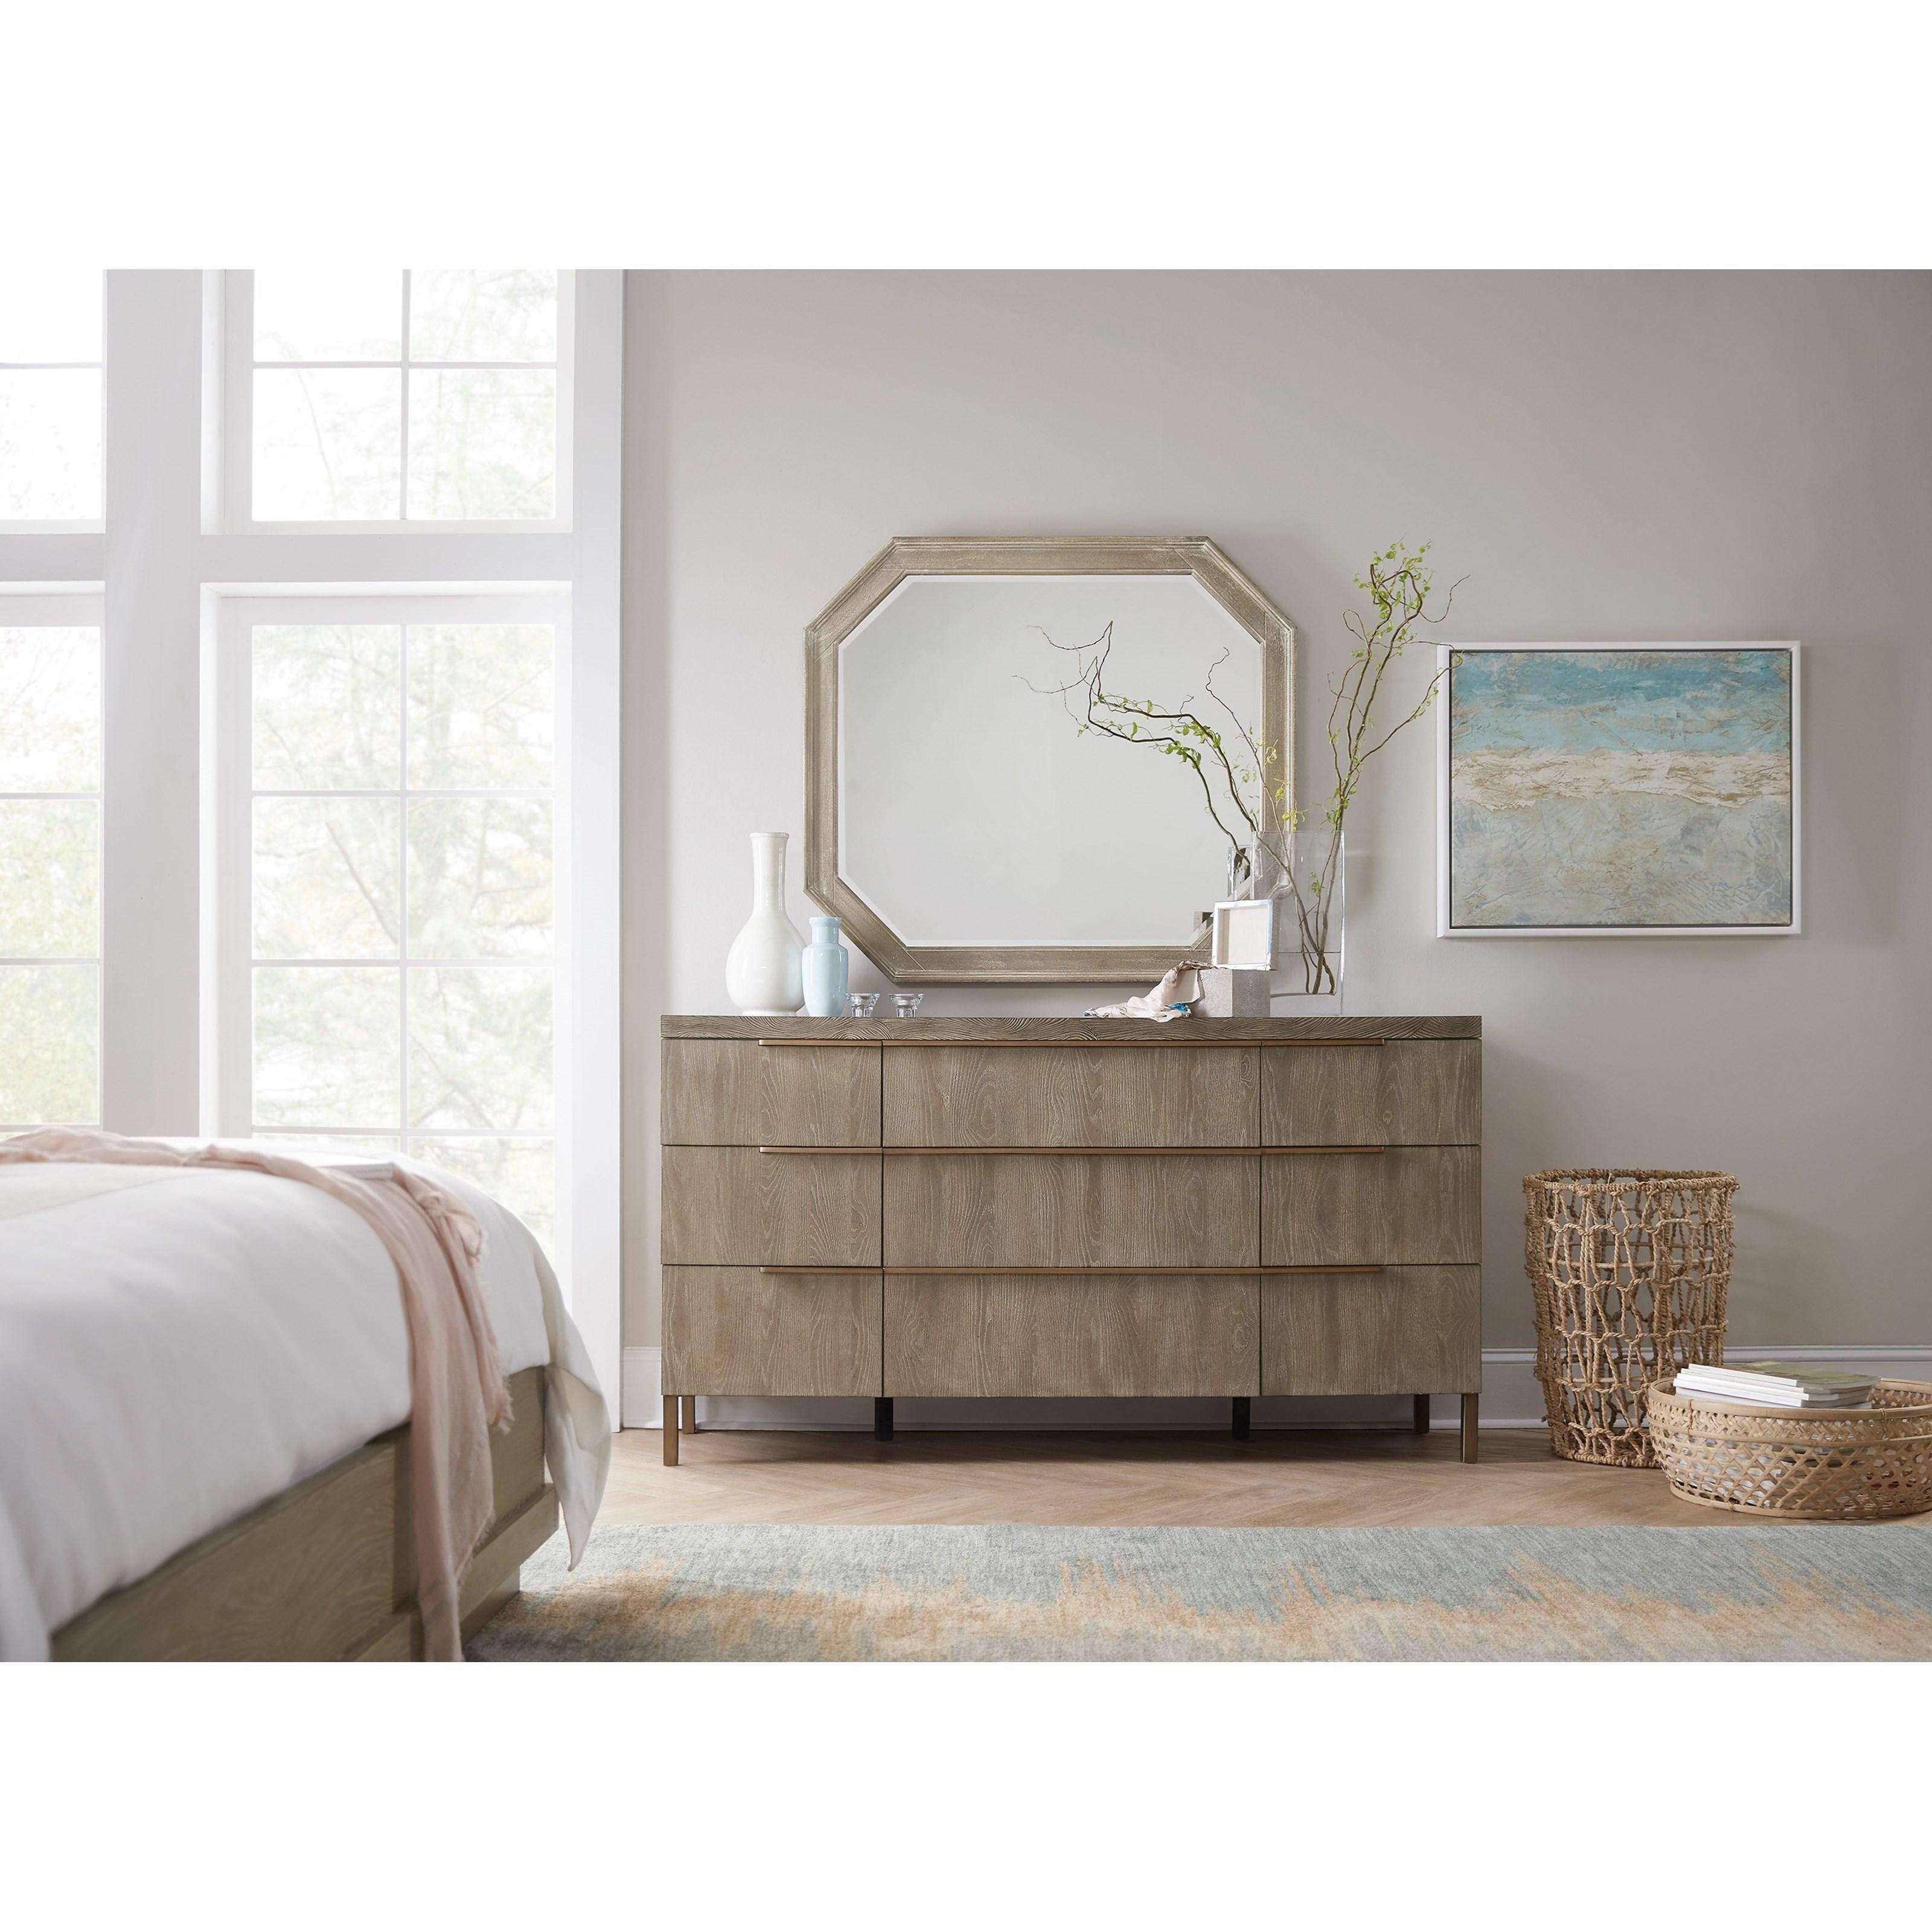 Hooker Furniture Pacifica 6075 90007 Ltwd Octagonal Mirror